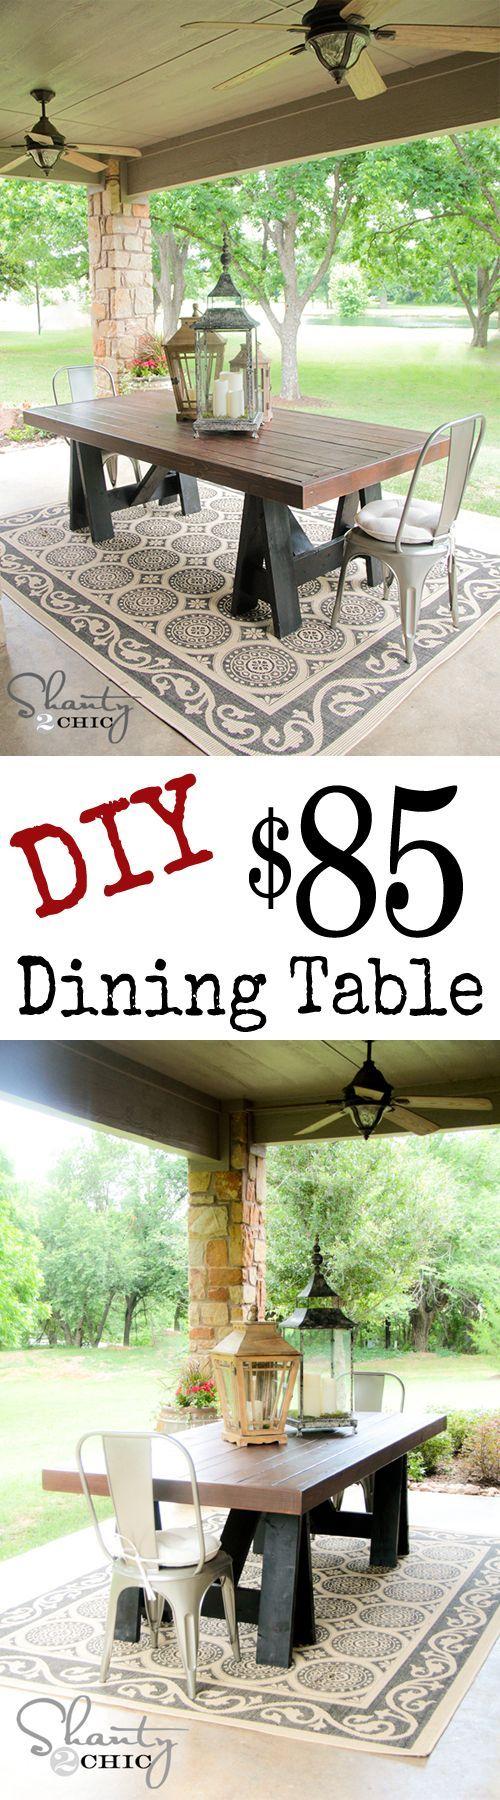 DIY Pottery Barn Dining Table! LOVE!